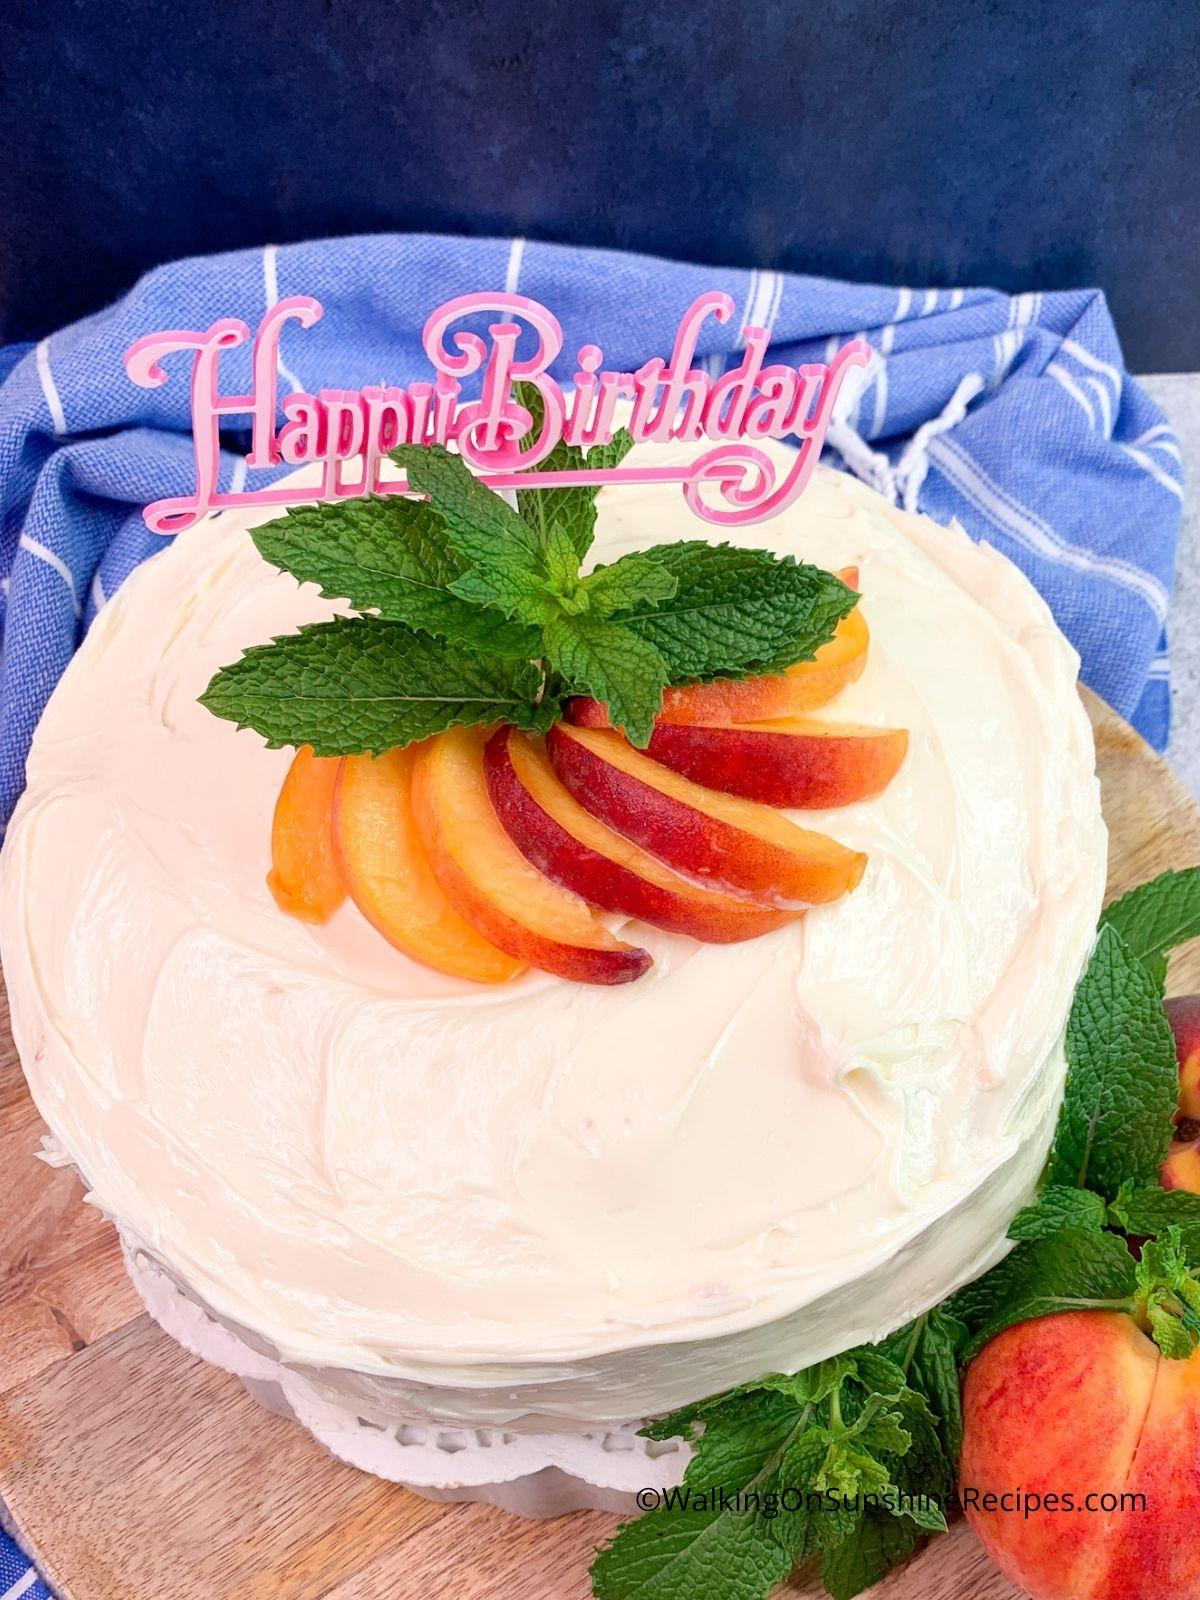 peach birthday cake with fresh peaches.